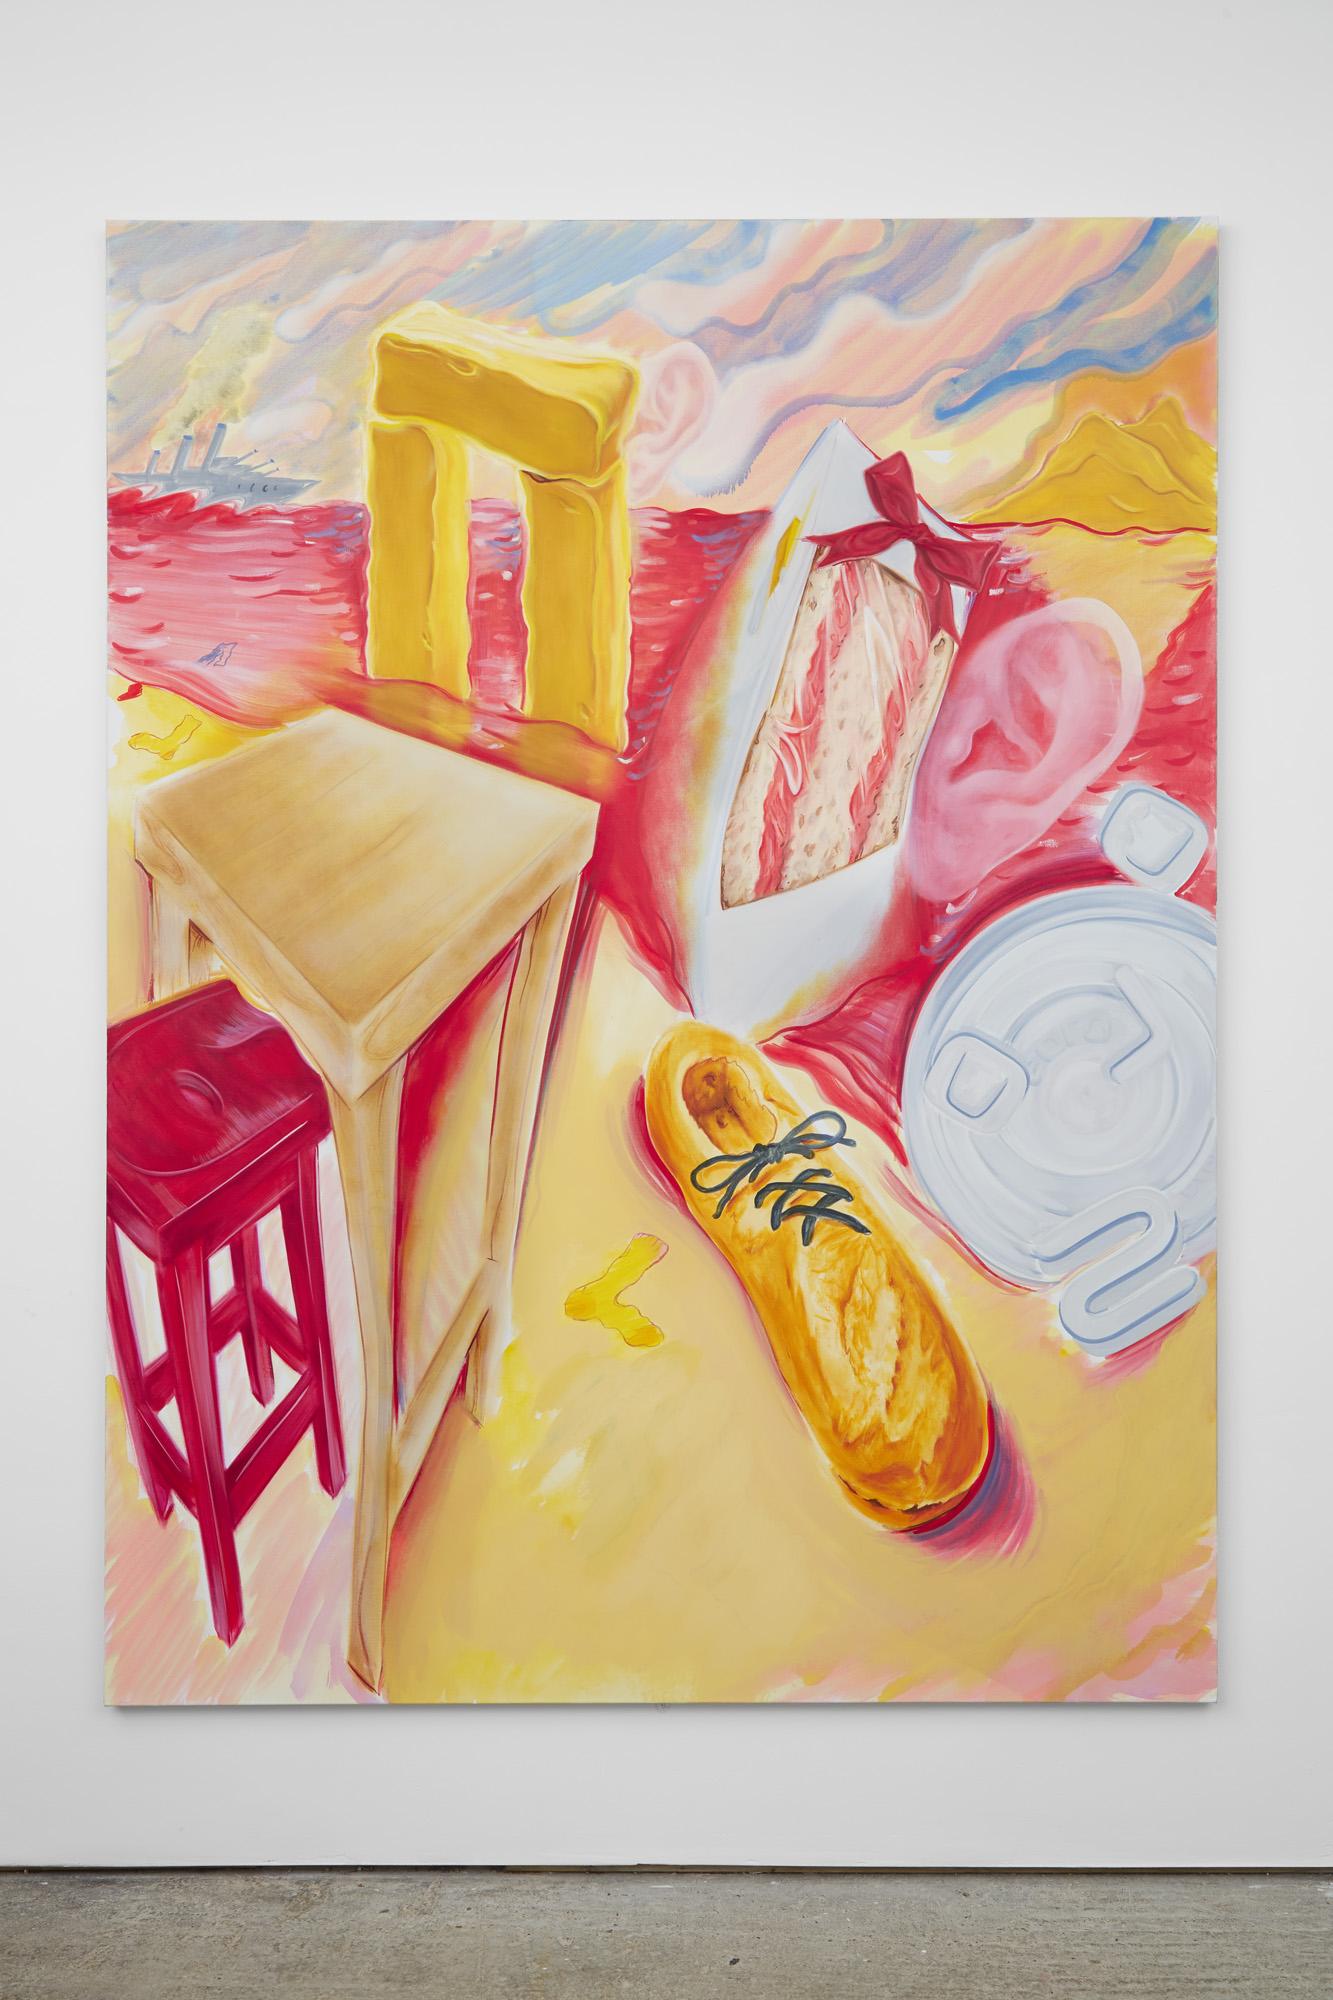 Nicholas Hatfull, Paysan (la logica del wrackaging) ,2016, oil and acrylic on canvas,240 x 180 cm